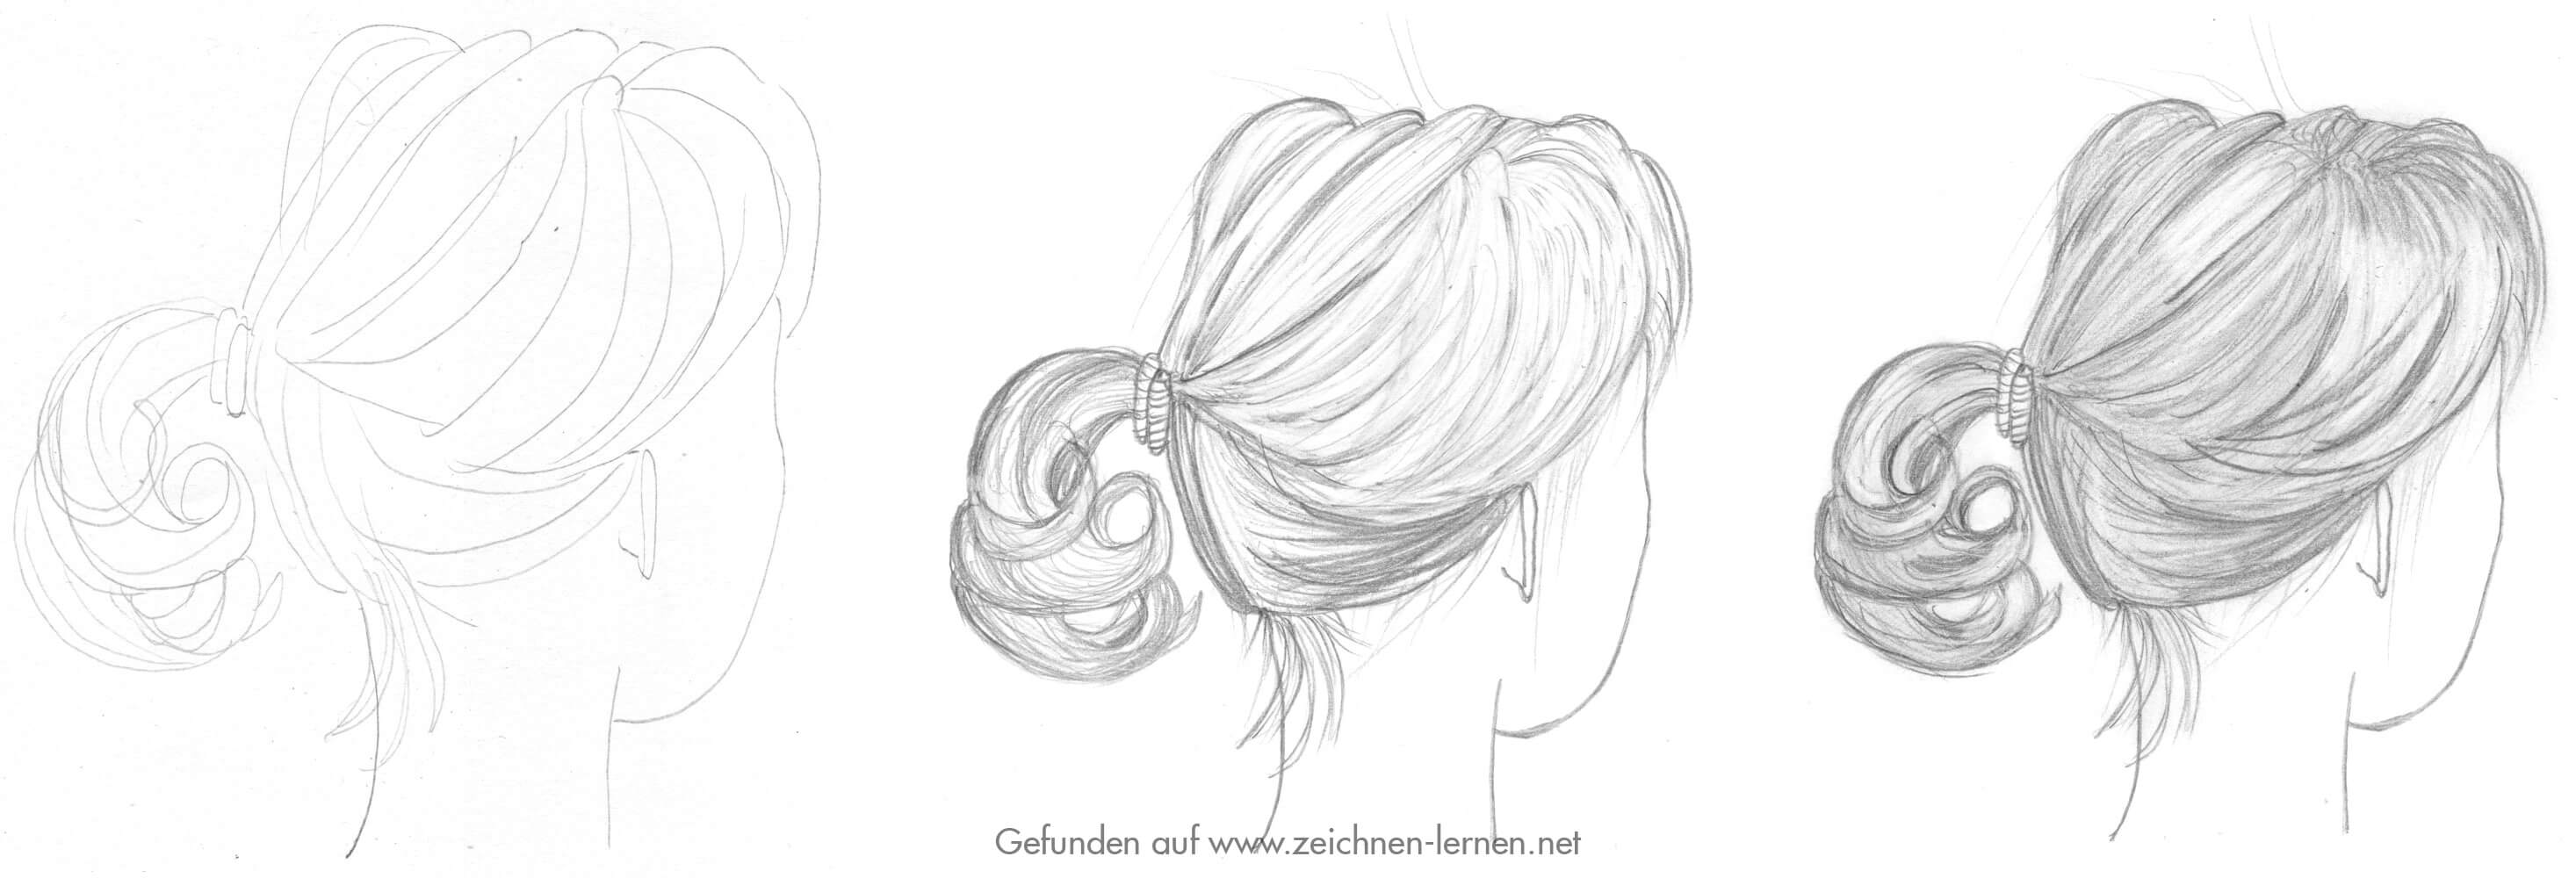 Bleistiftskizze Haare Frisur Zopf